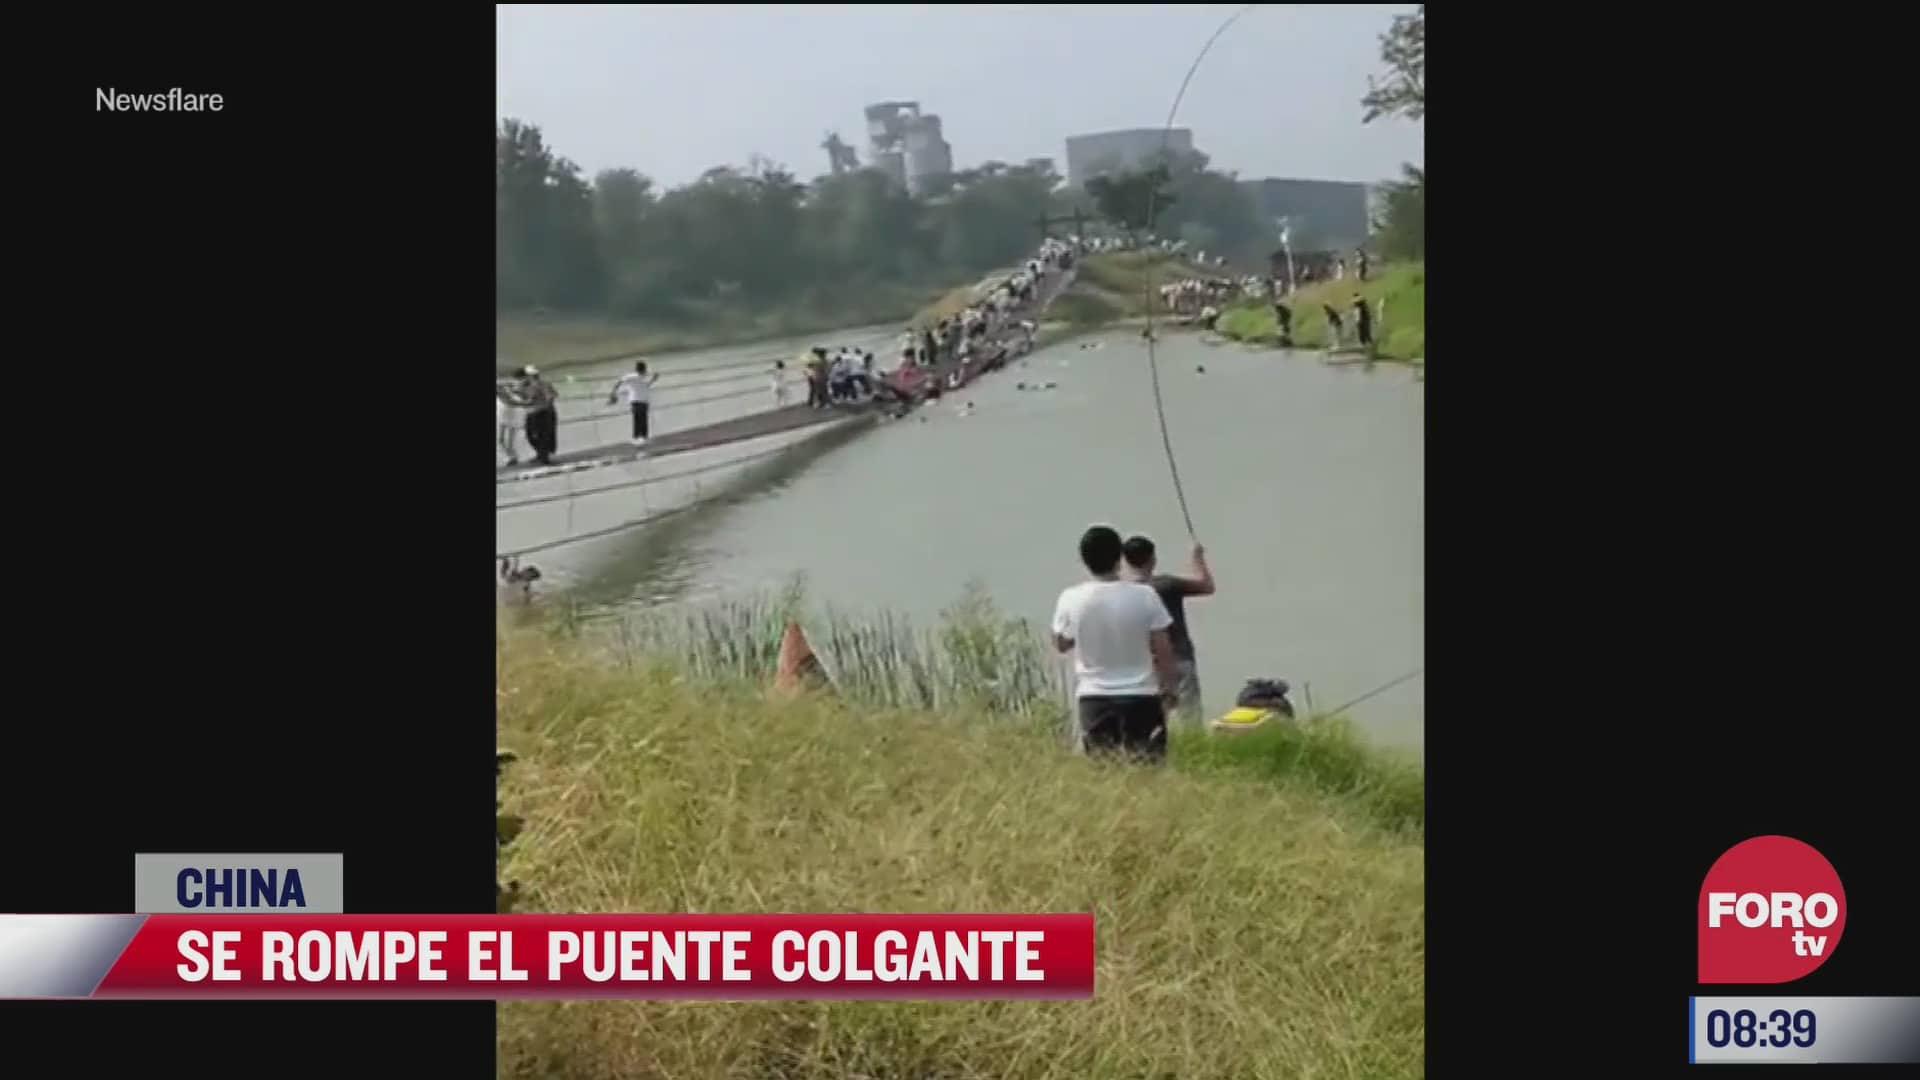 se rompe puente colgante en china